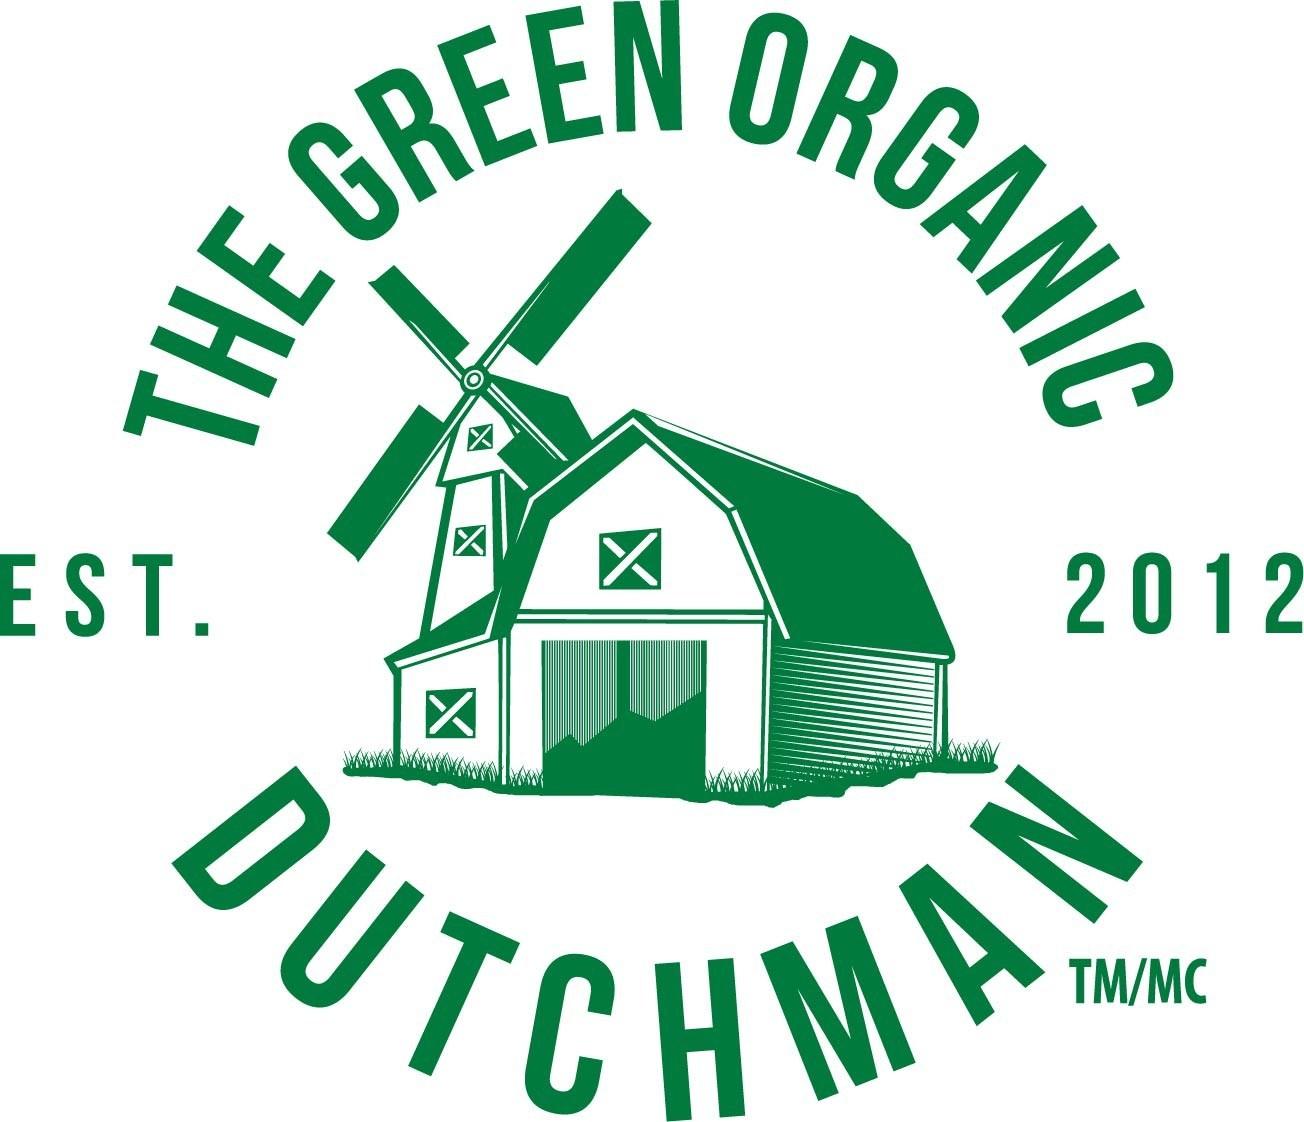 Green Stock News